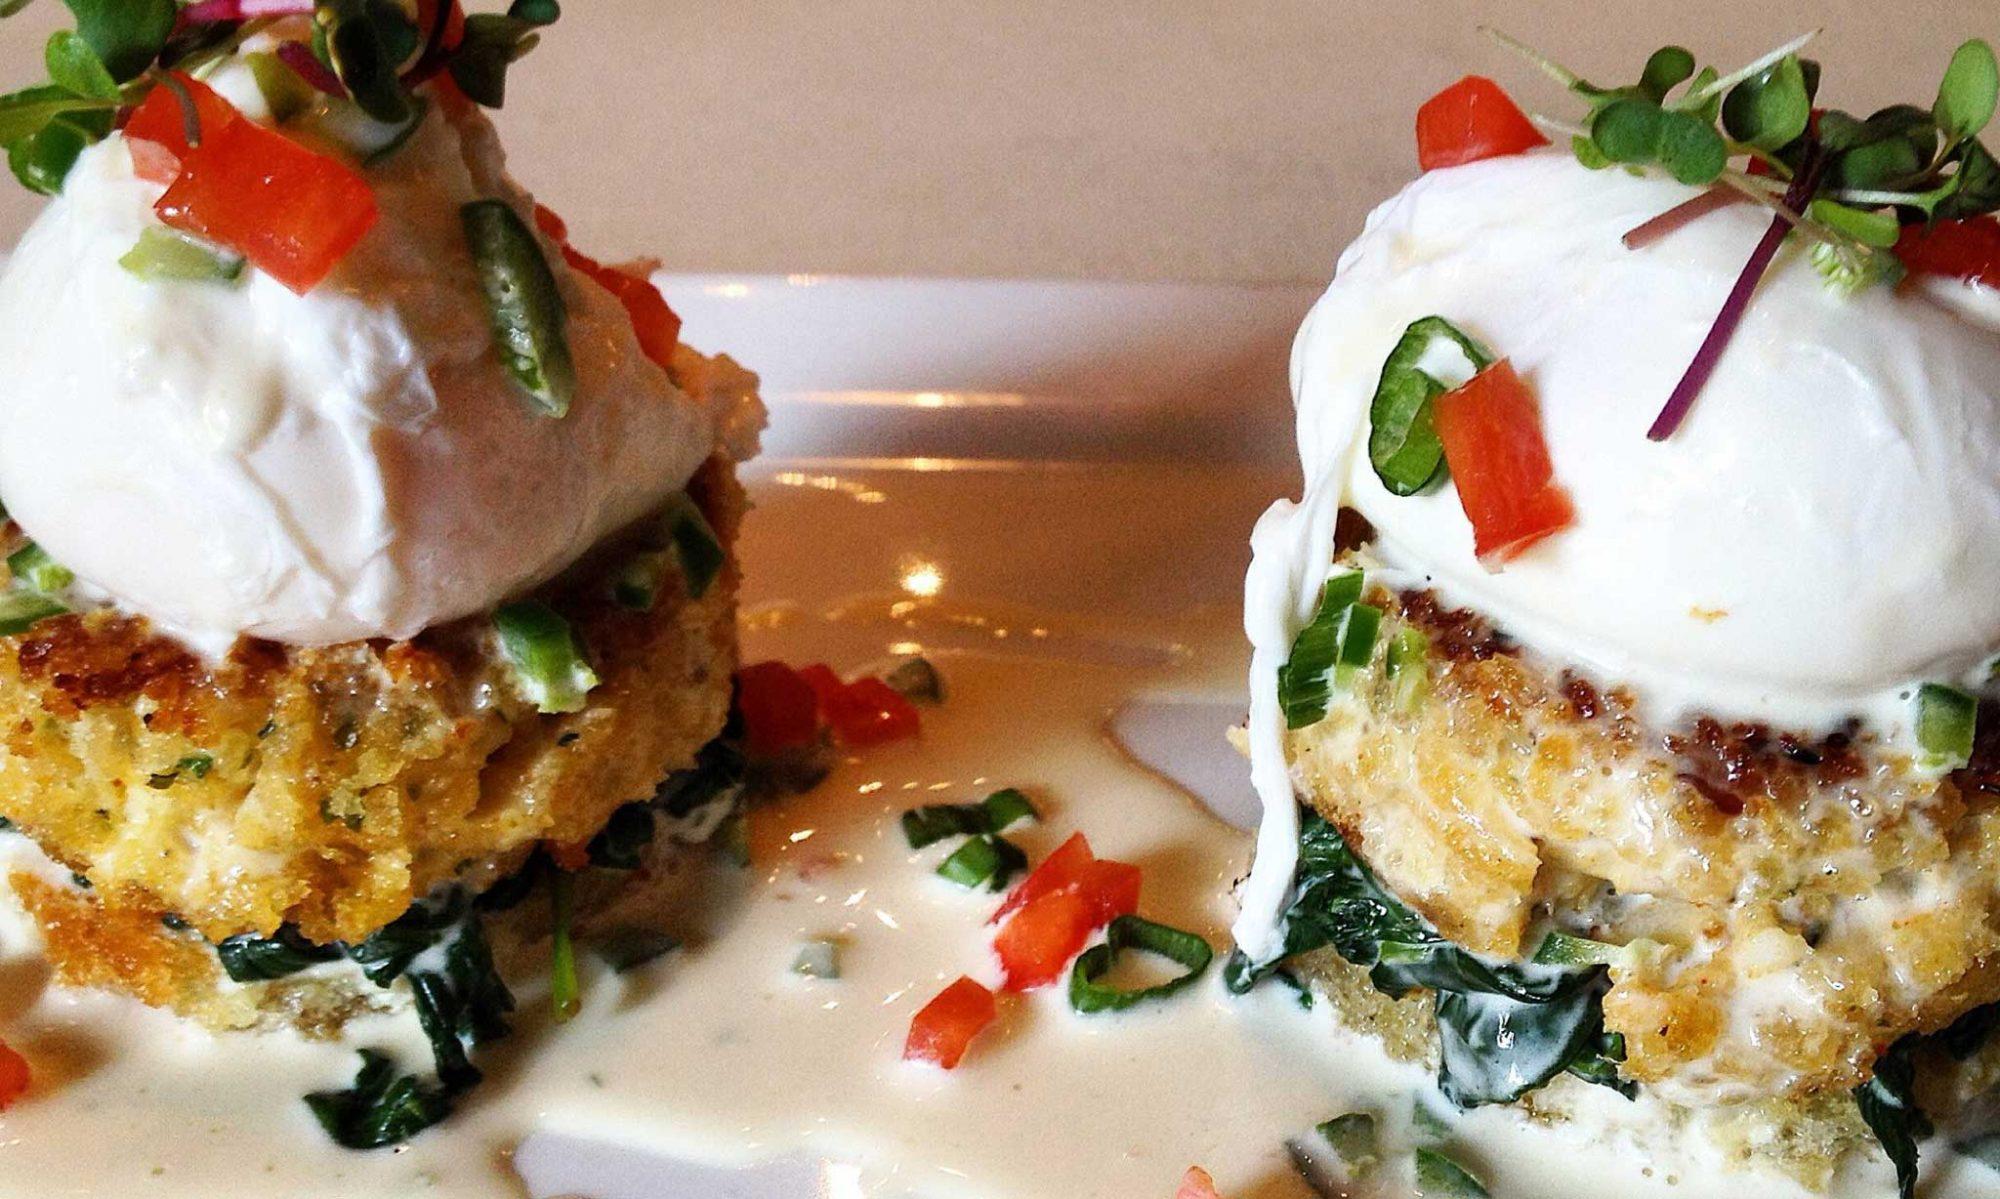 EC: Make Crab Cakes with Jalapeño Beurre Blanc Instead of Eggs Benedict